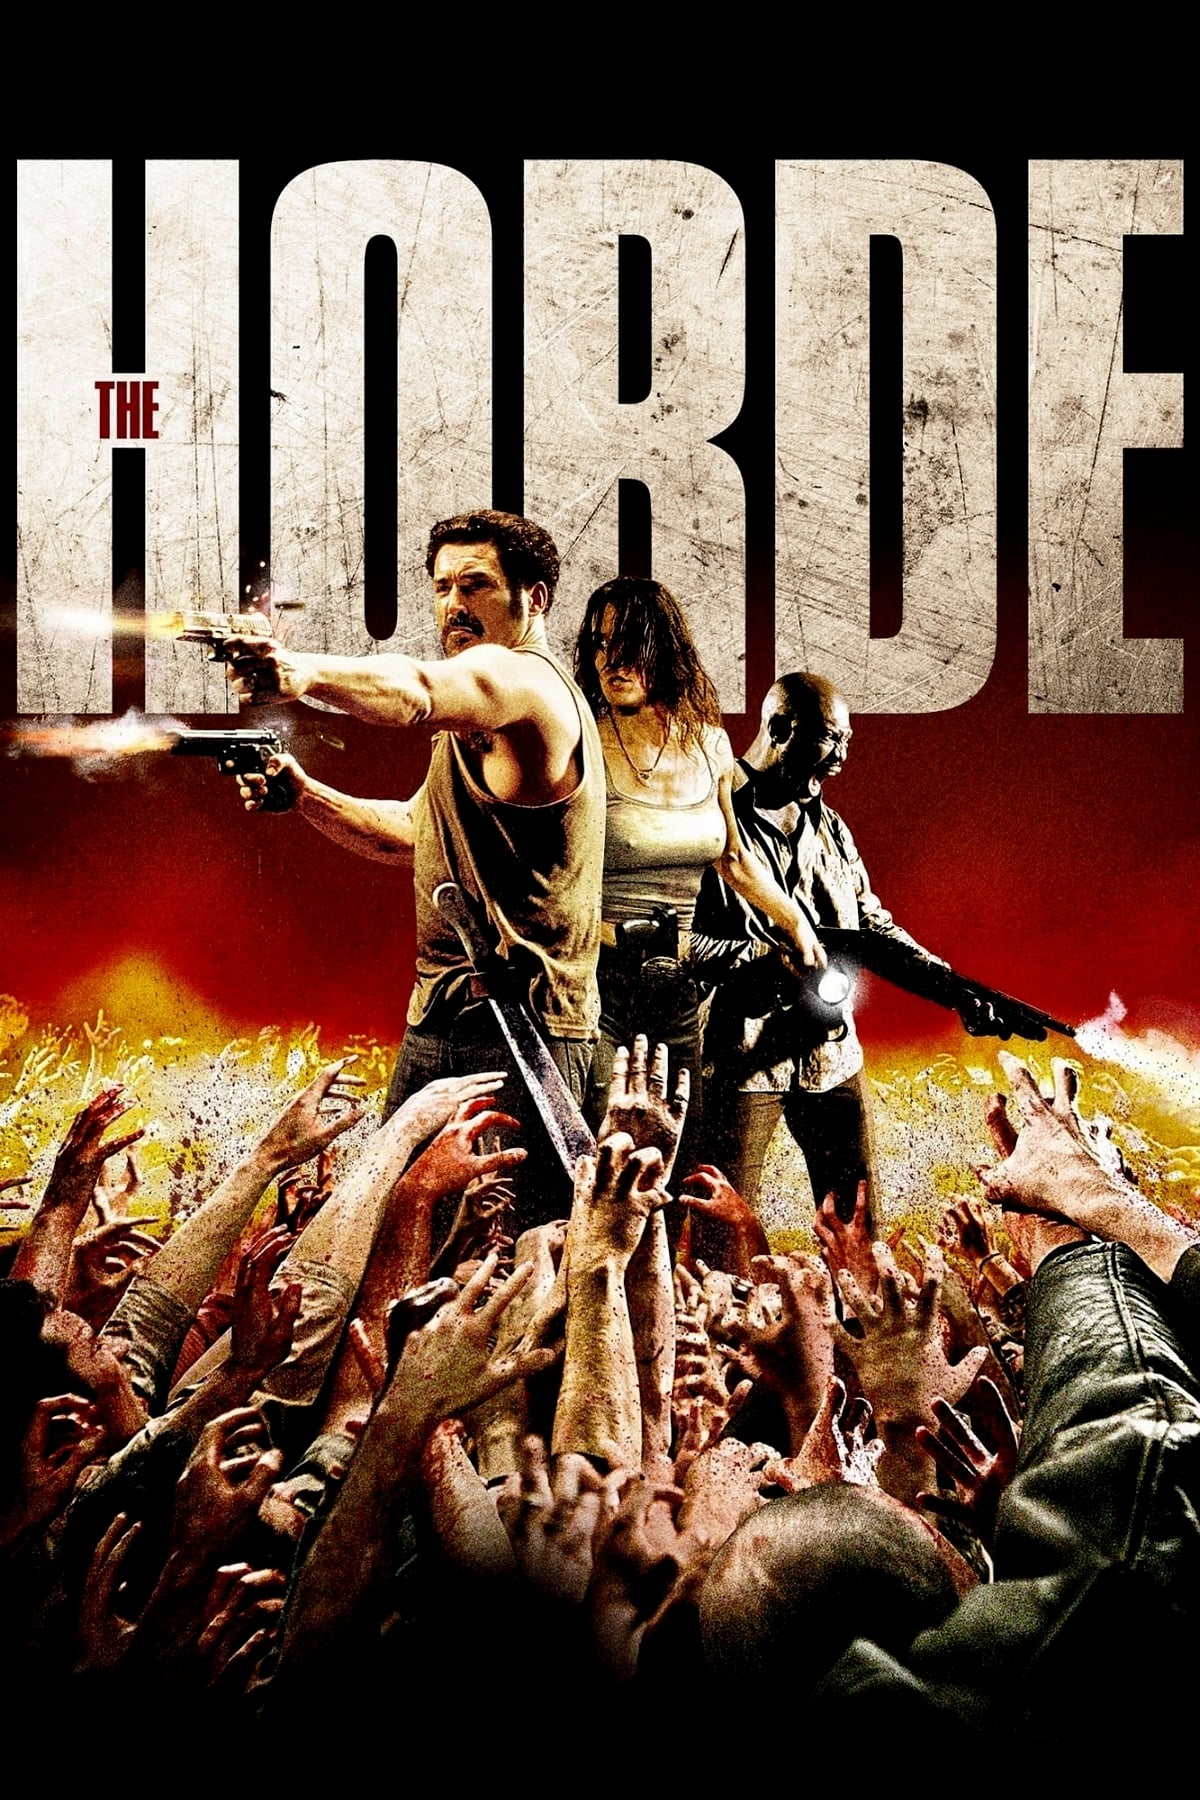 The Horde (2010)